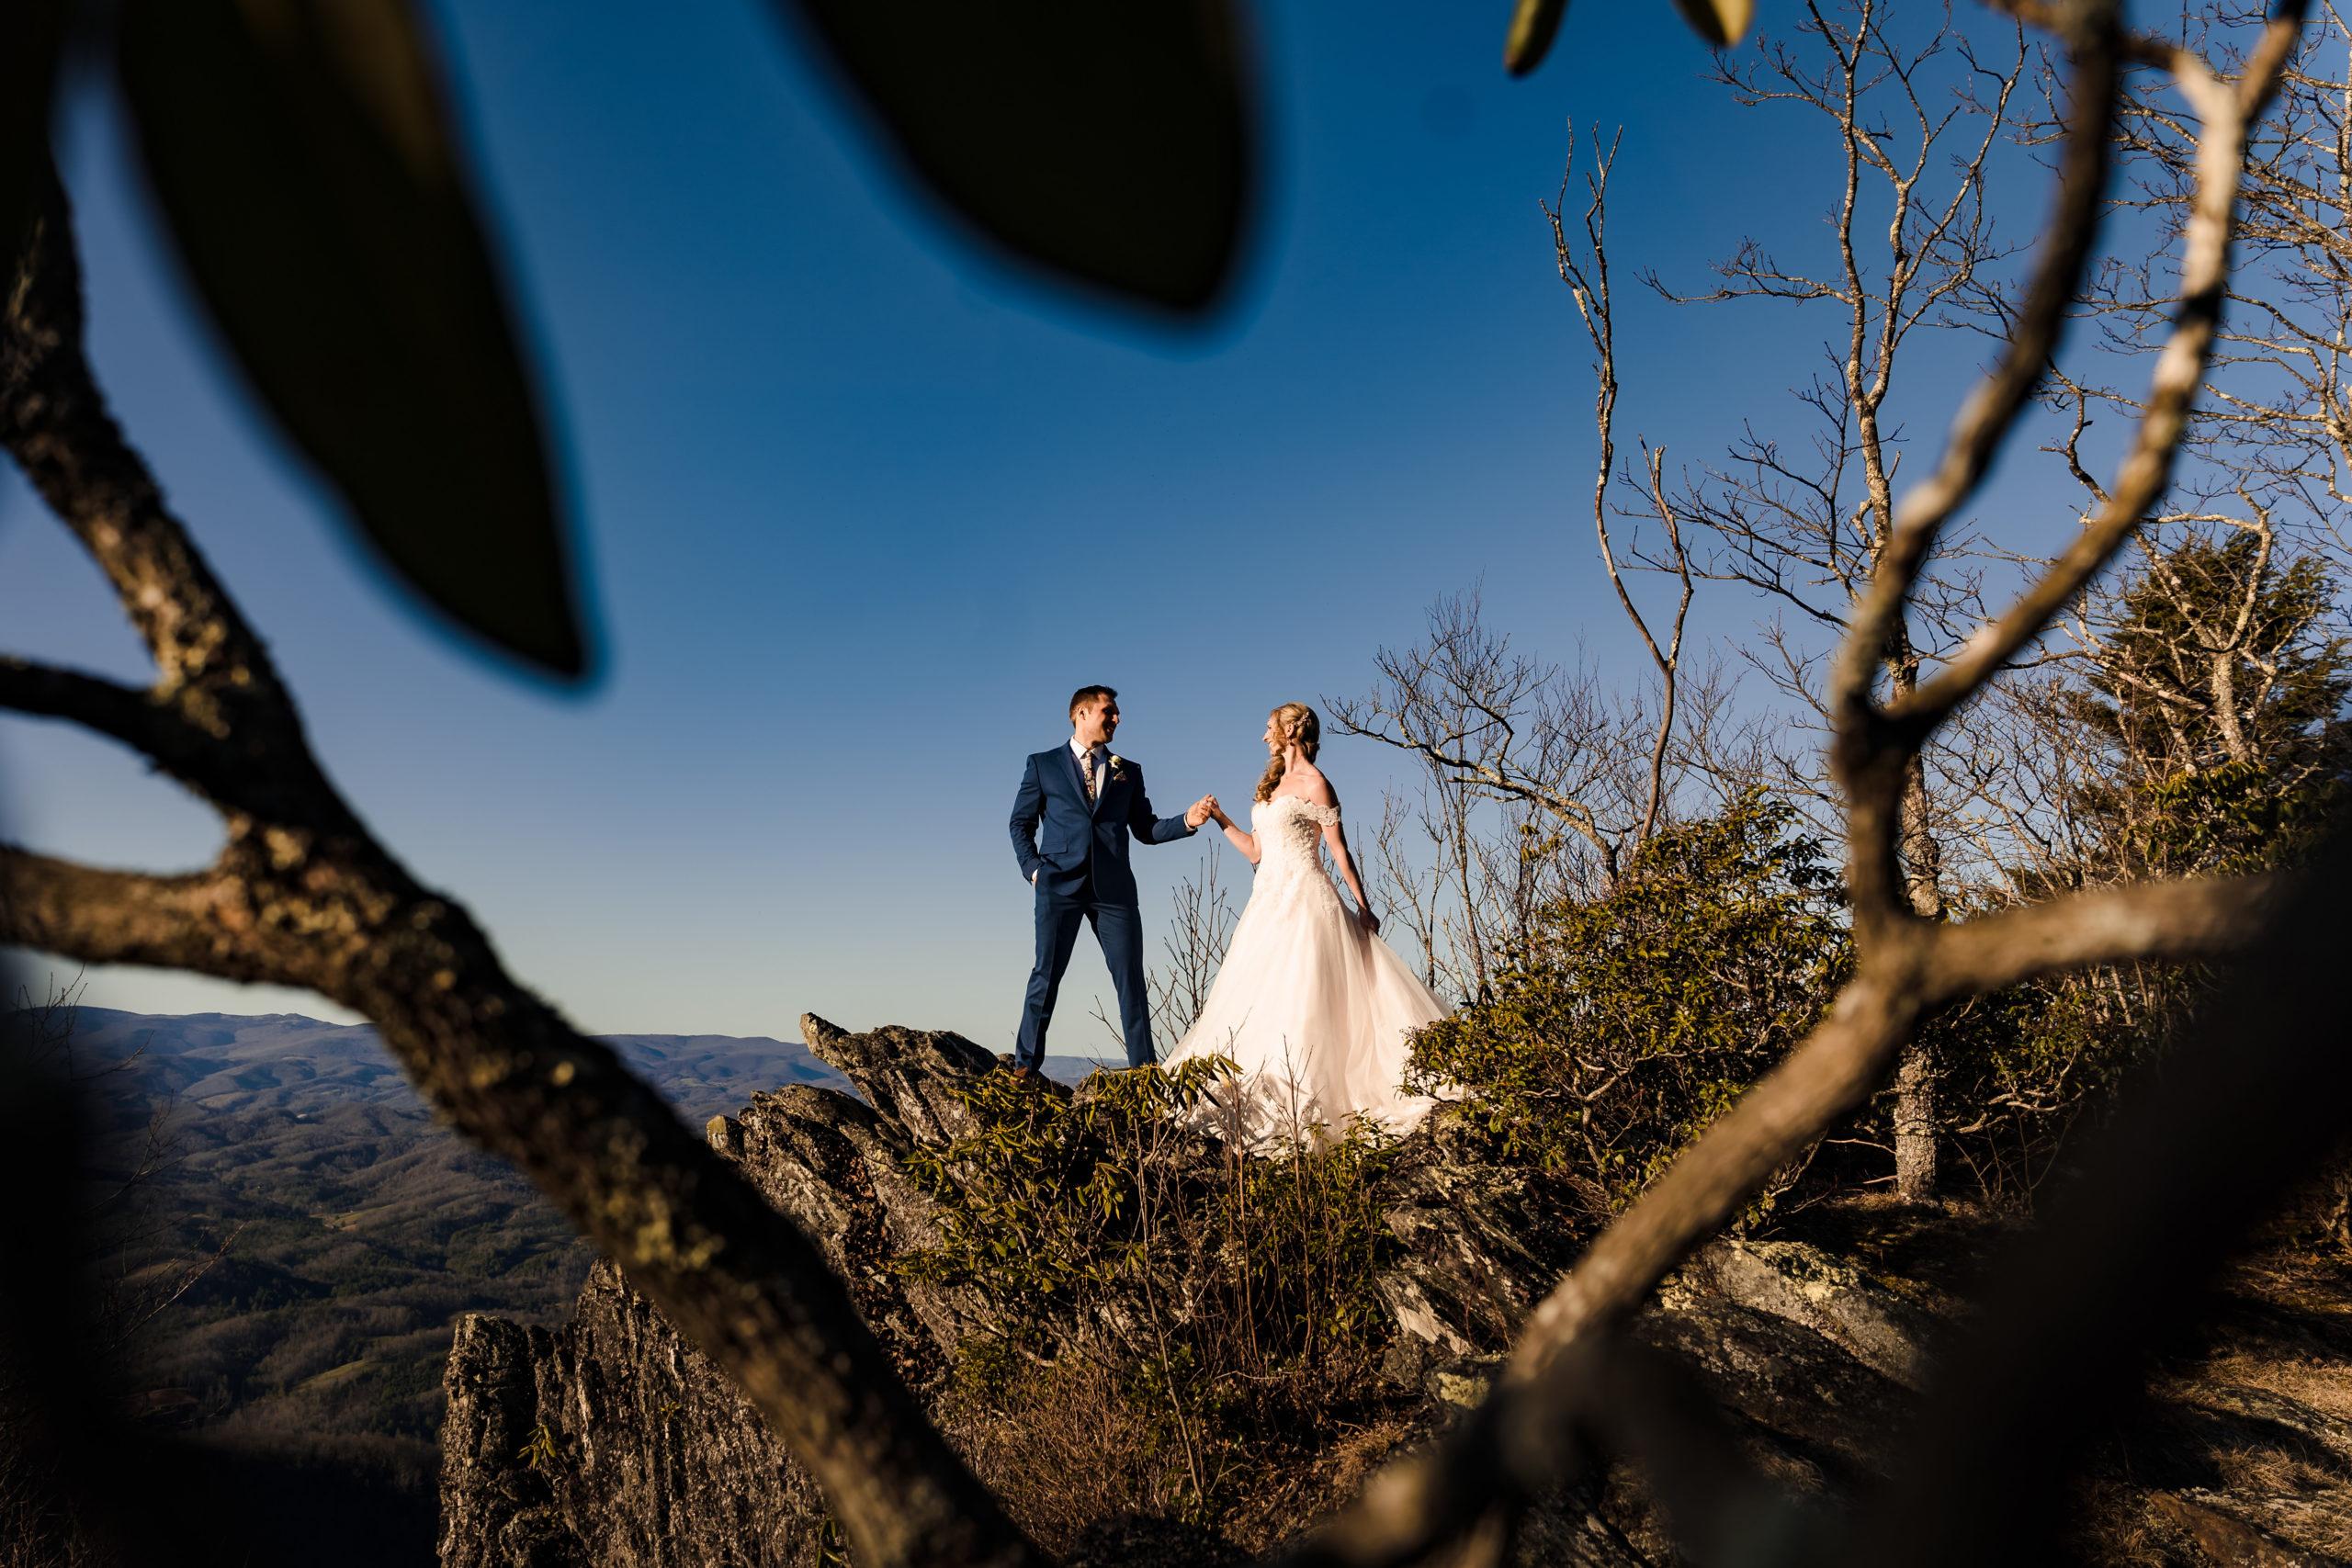 Fairy Tale Wedding in North Carolina Mountains